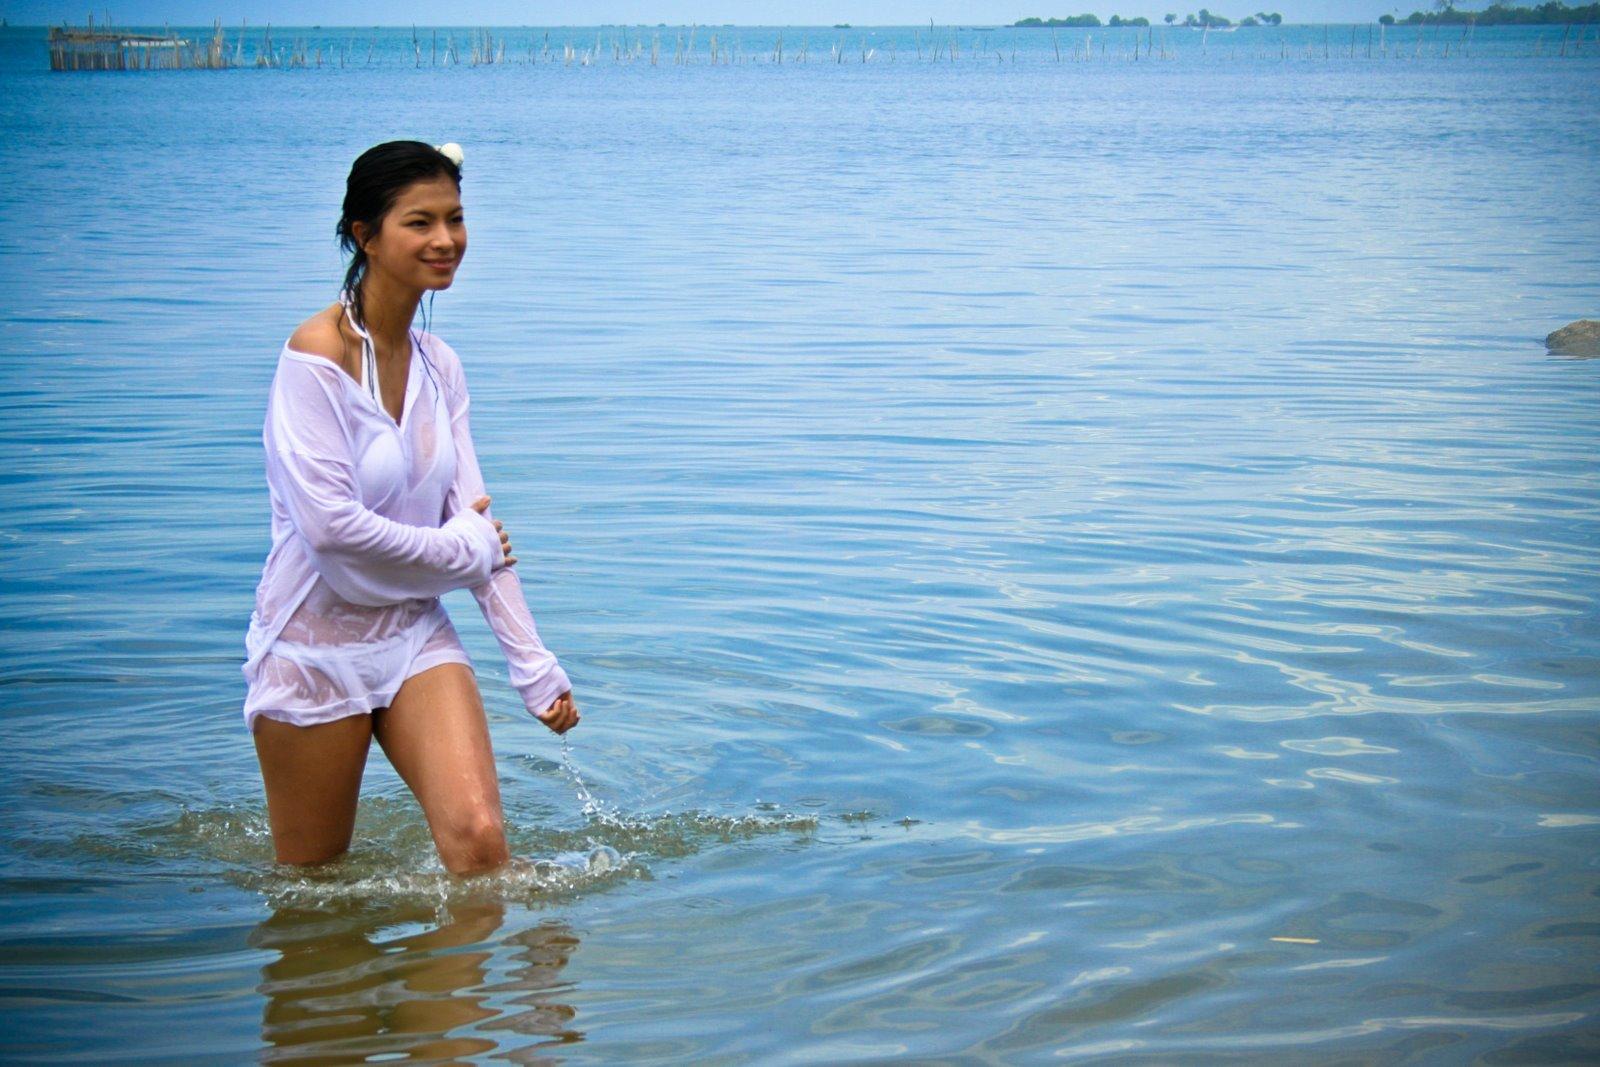 Sexy Angel Locsin Beach Photos | All Pinays - Scandal